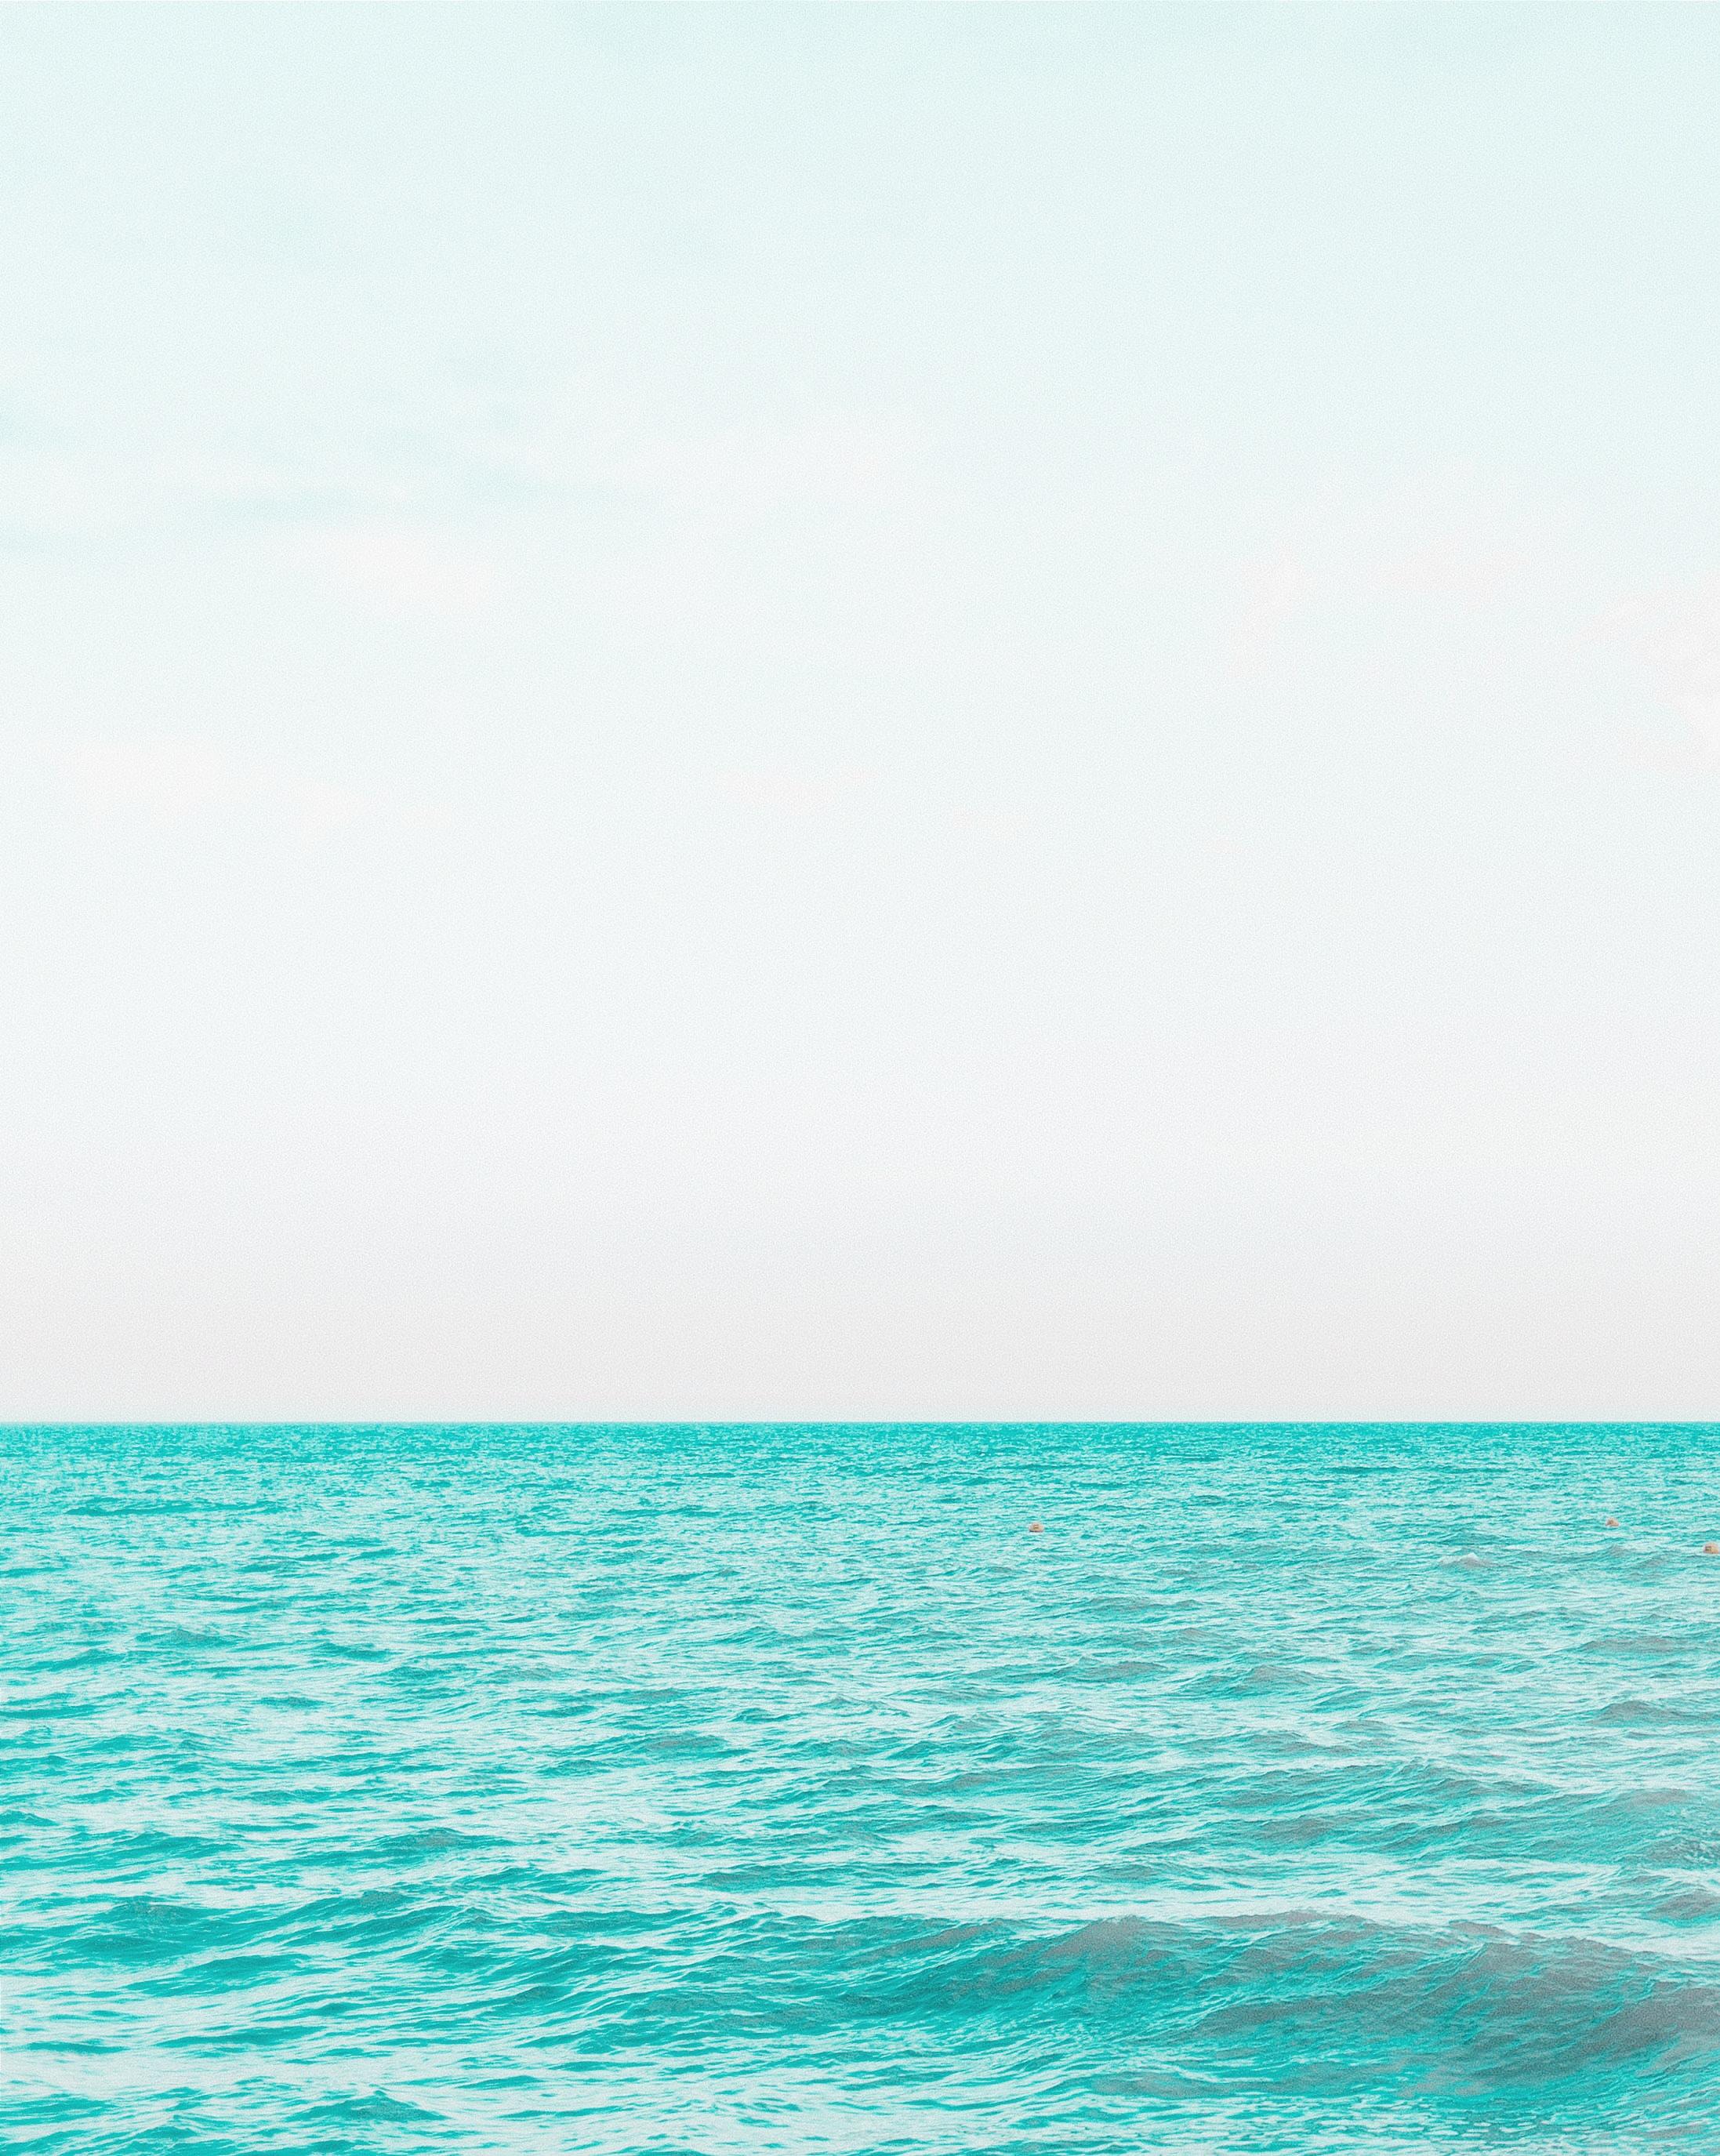 Teal blue waves.